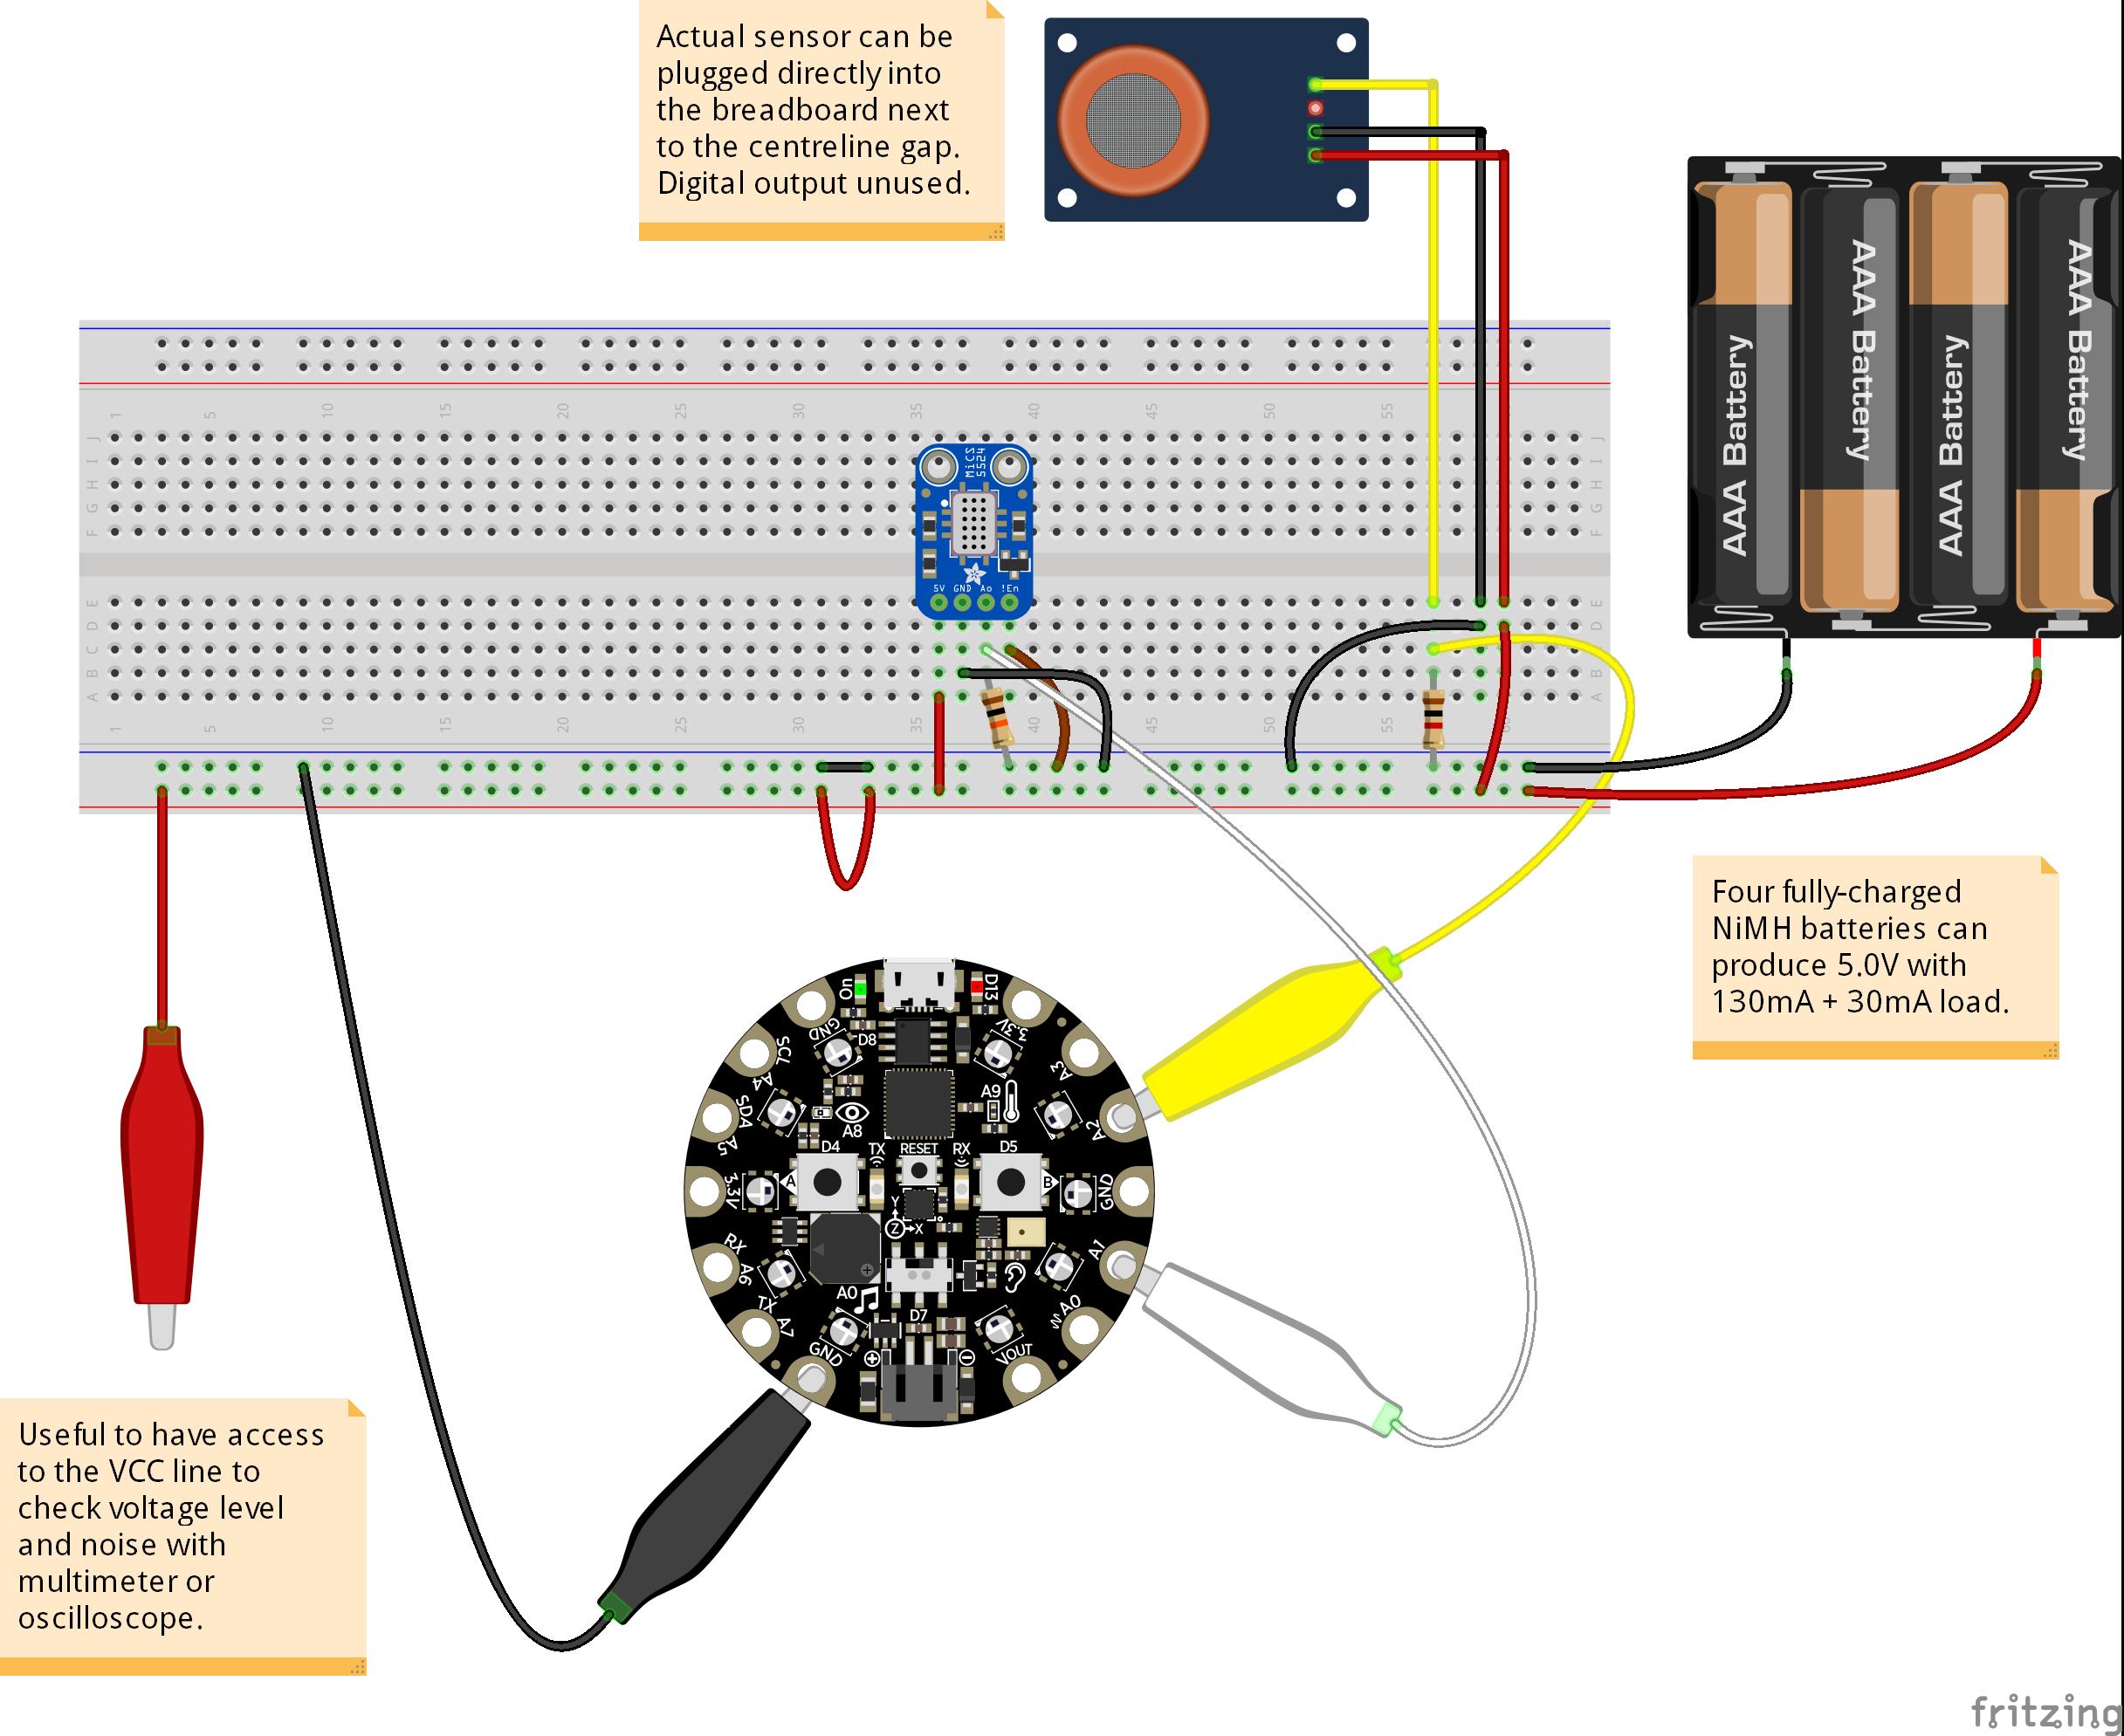 cpx-breadboard-gas-sensors-battery-nomosfet_bb.png